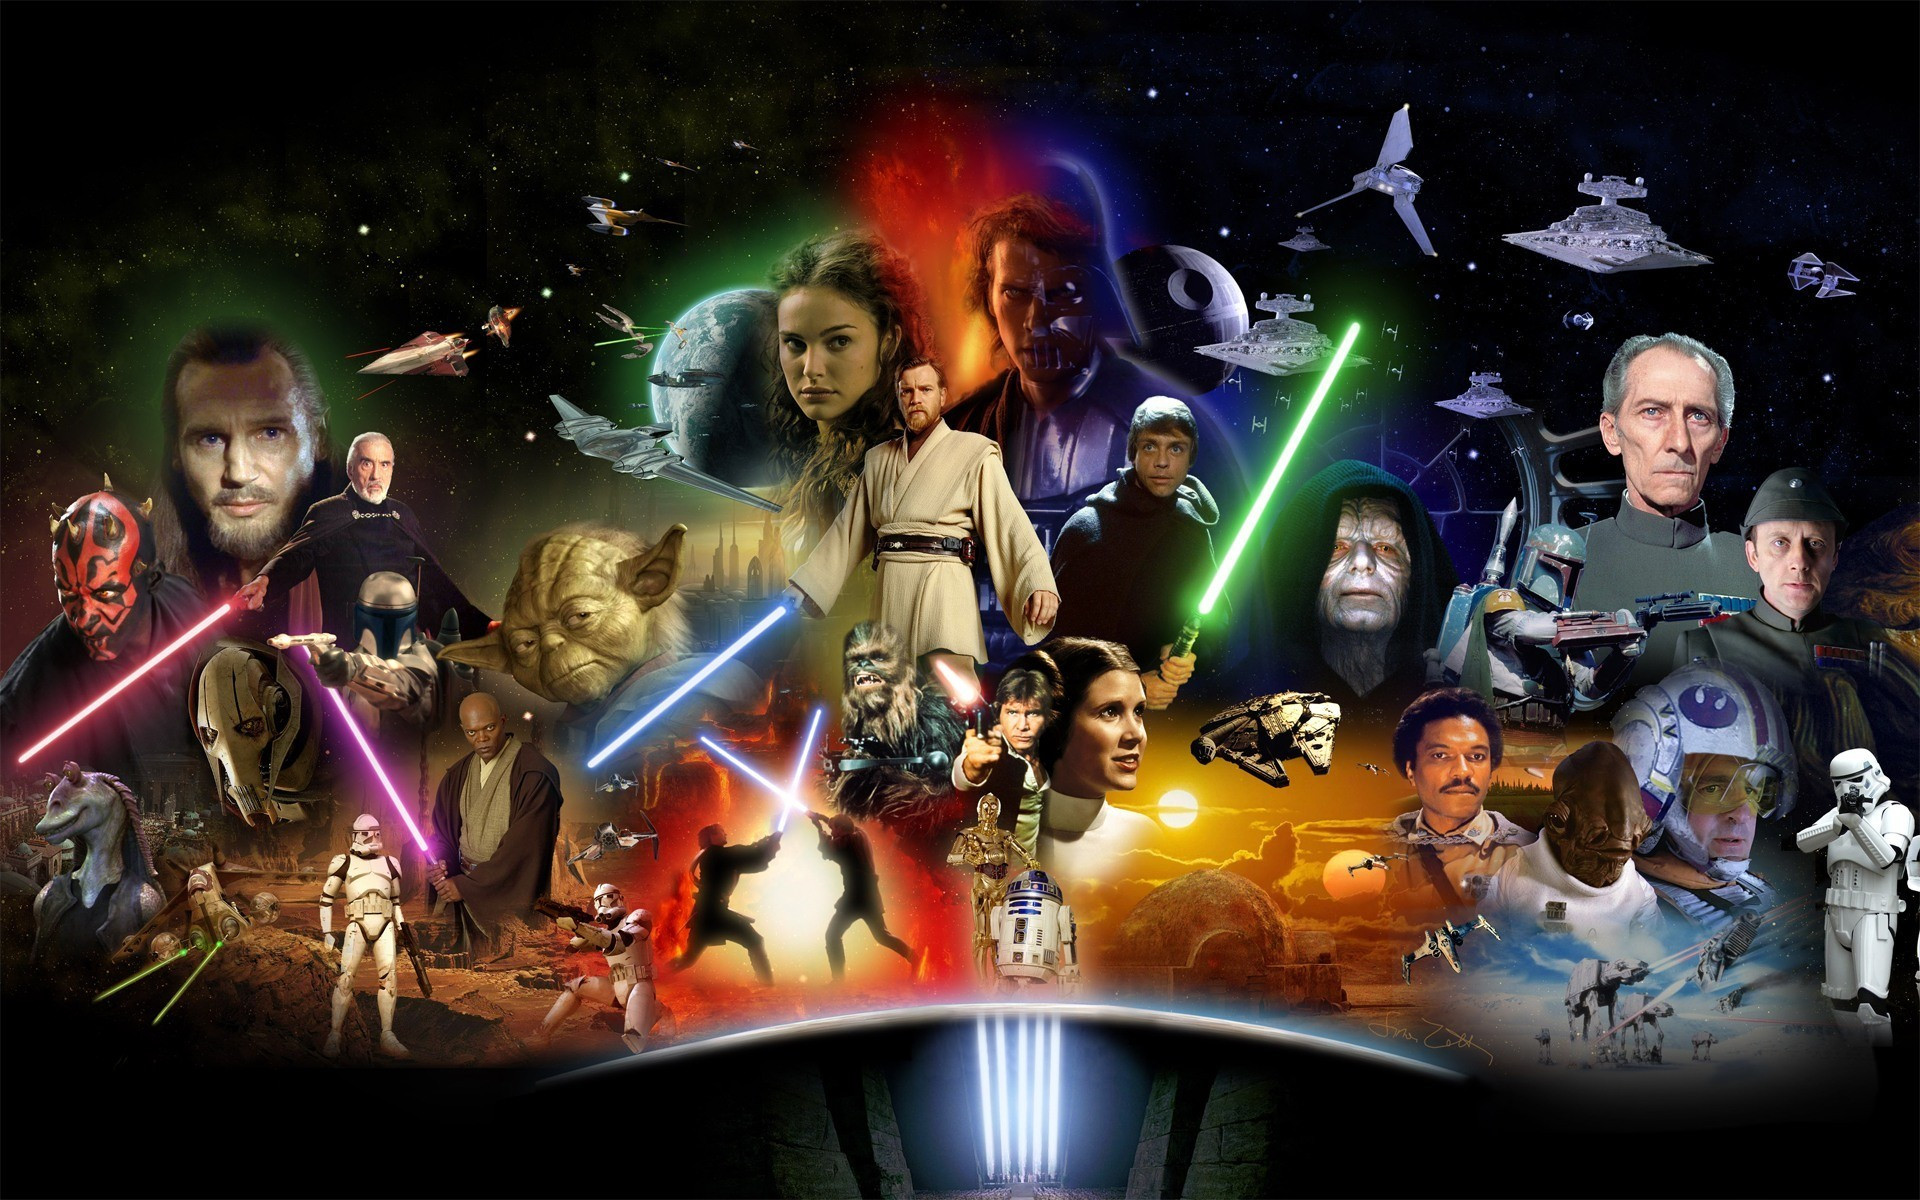 Una splendida immagine con i protagonisti Star Wars